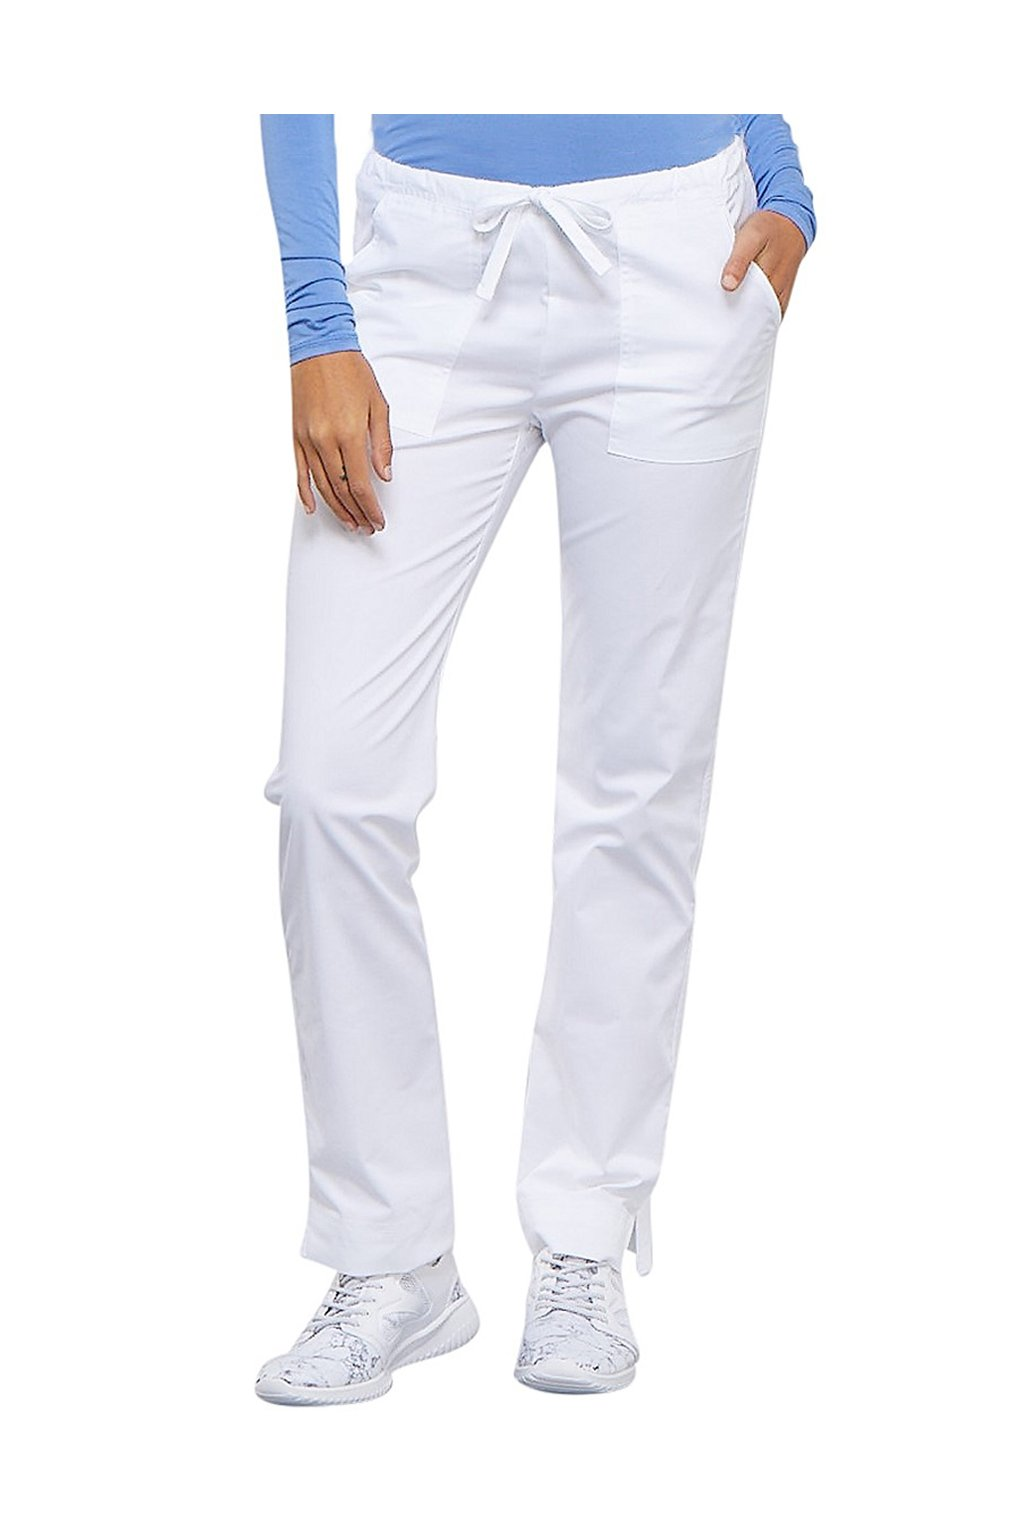 zdravotnicke-pracovni-kalhoty-cherokee-core-stretch-4203-01